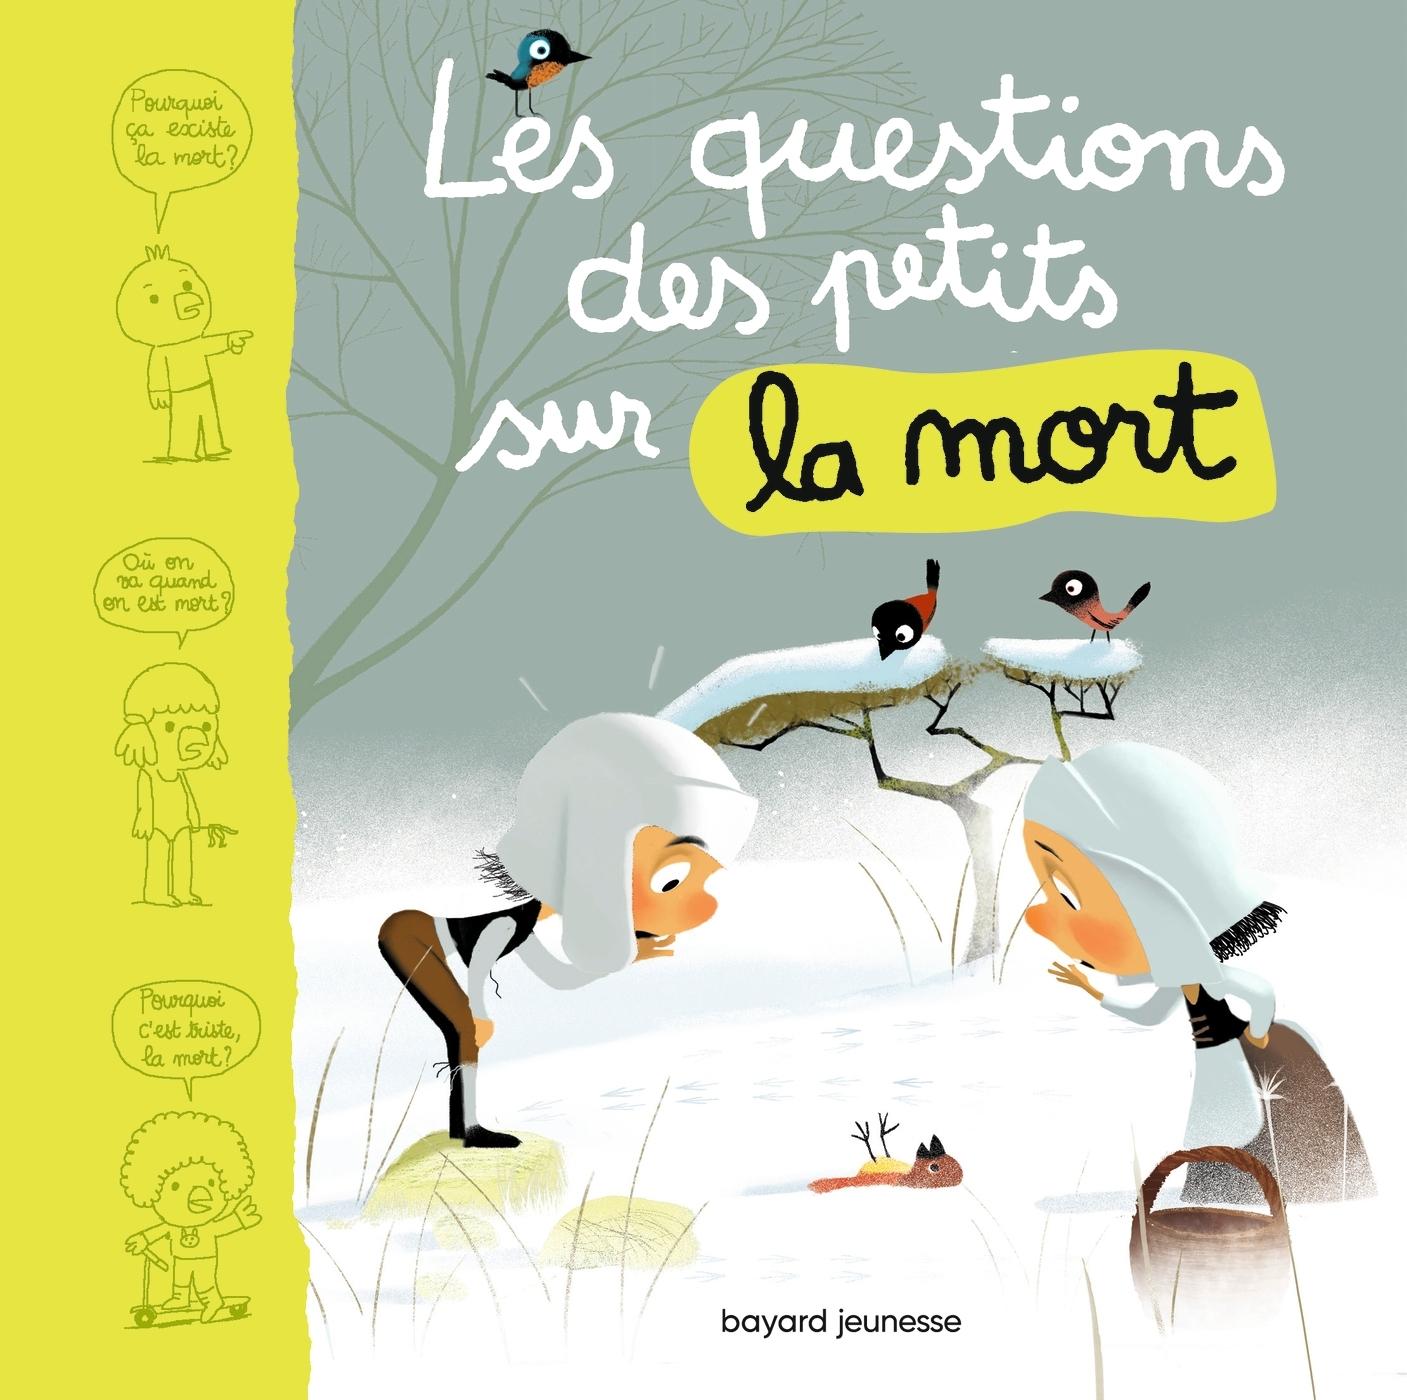 LES QUESTIONS DES PETITS SUR LA MORT